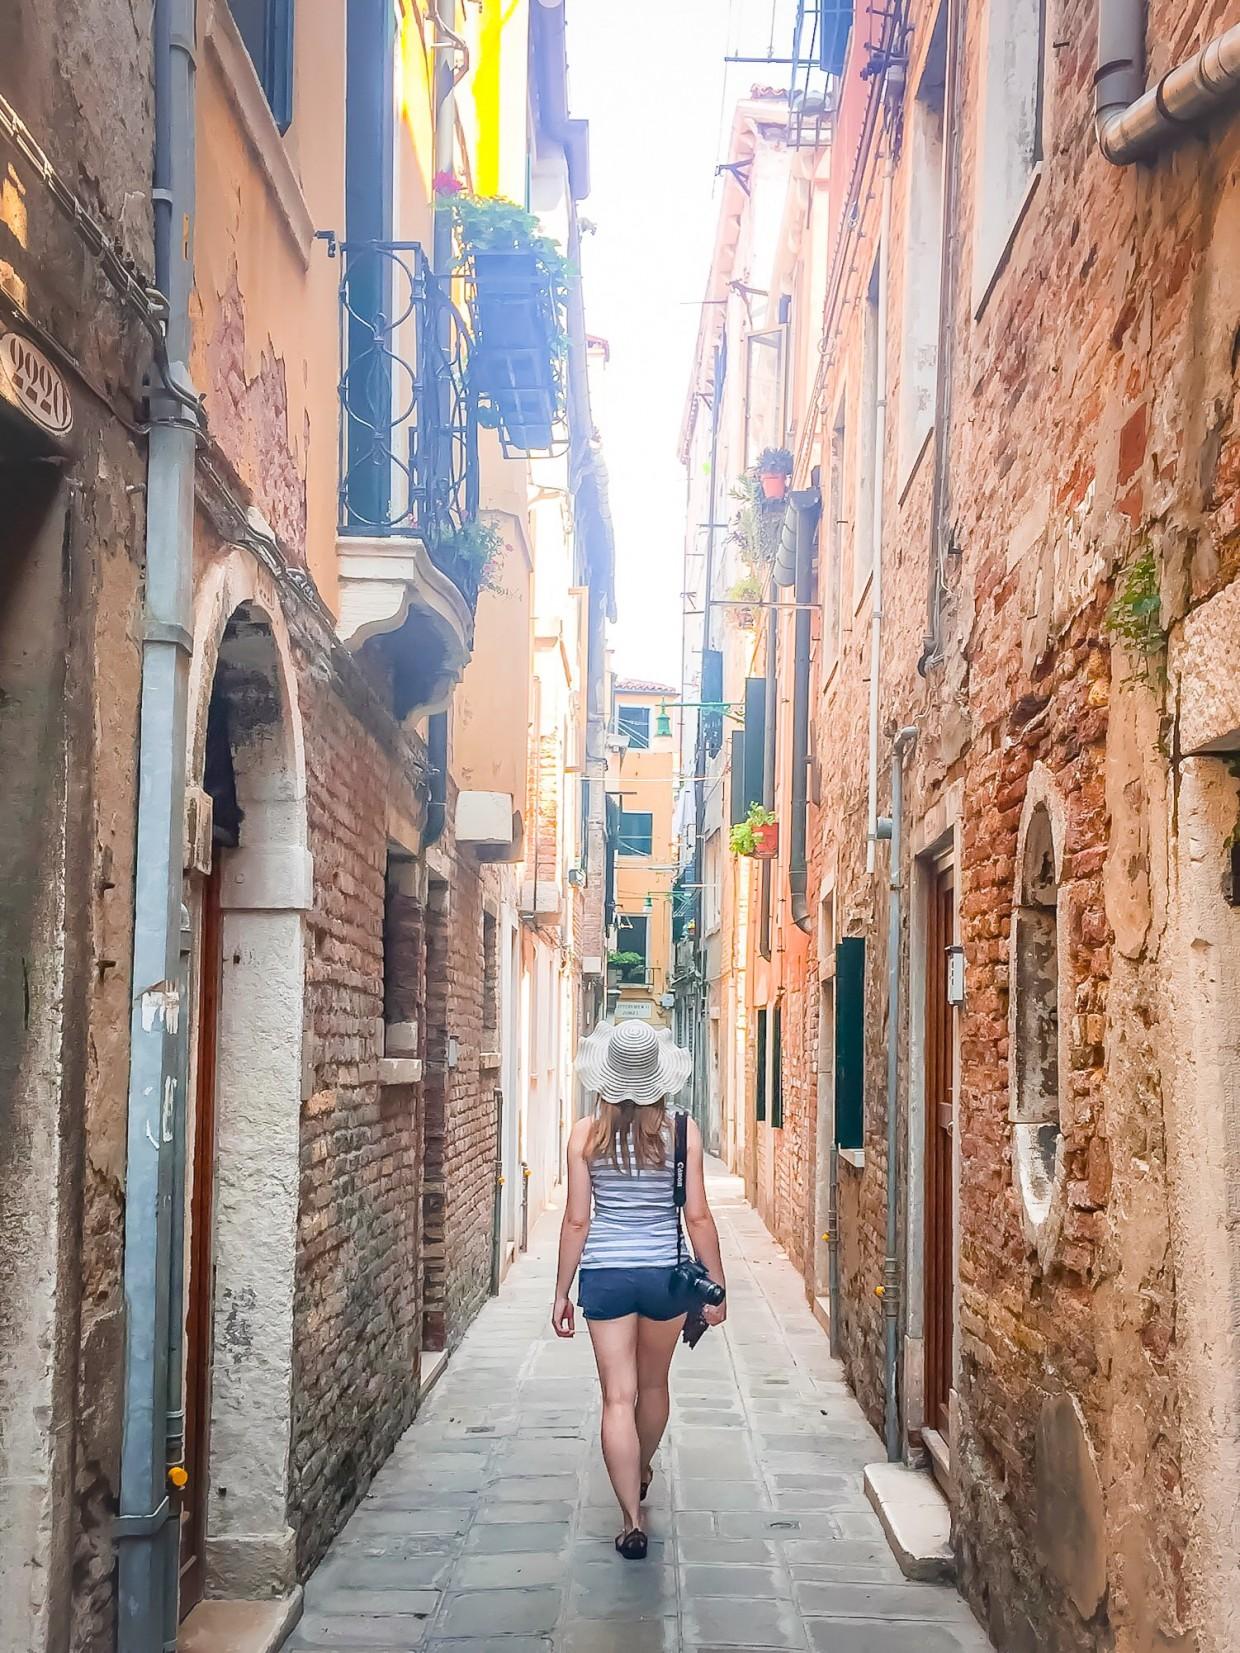 Small streets in Venice